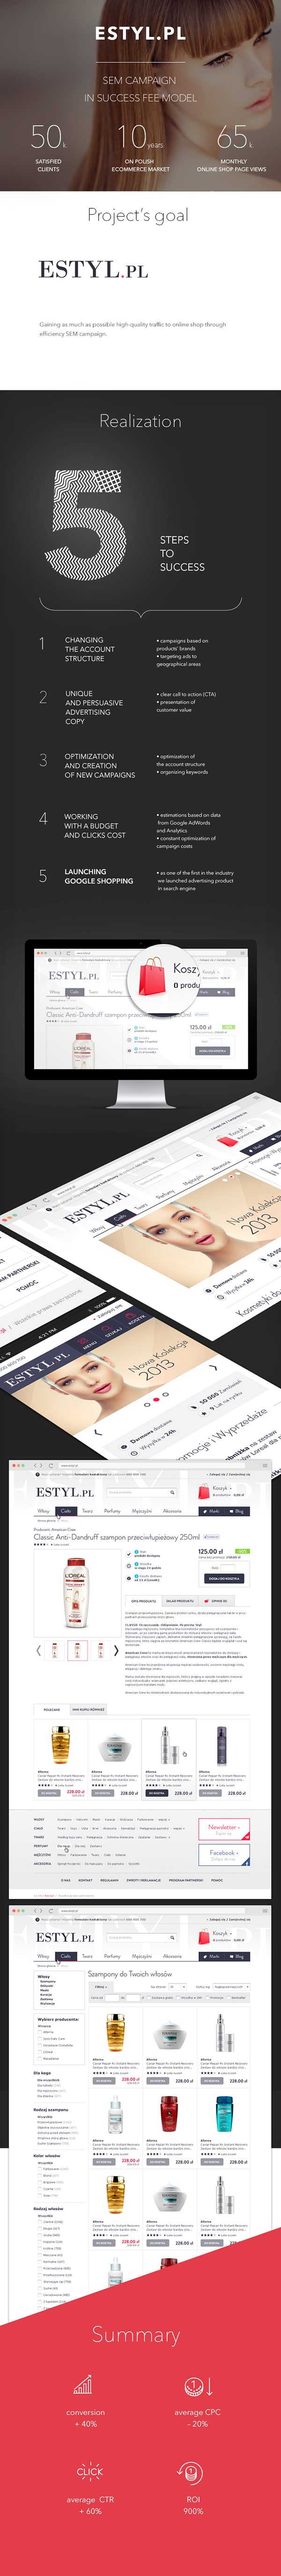 Estyl.pl ideacto SEM success fee campaign Avertising